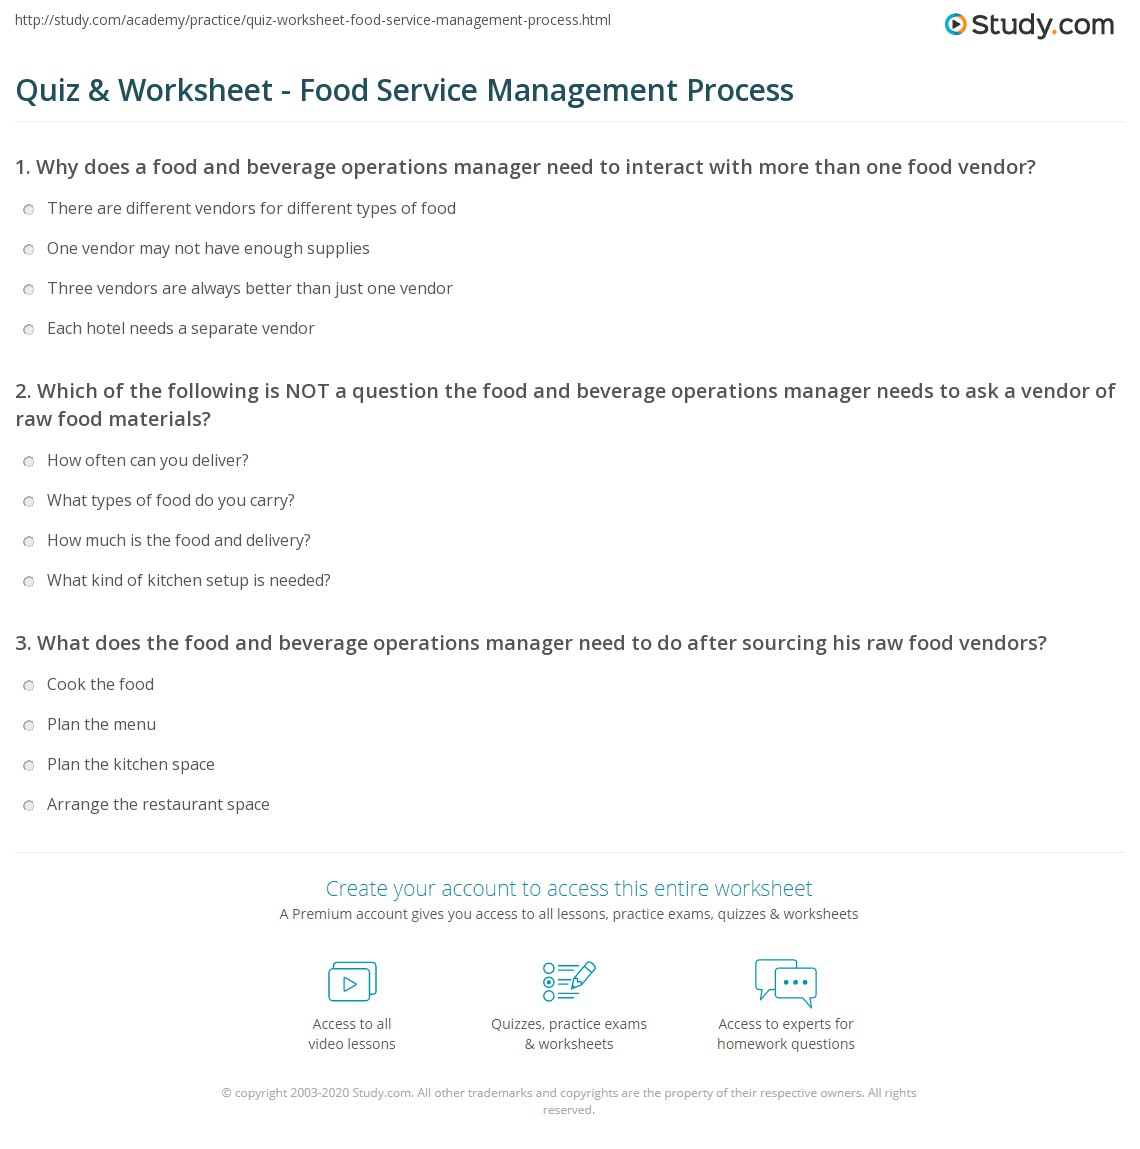 Print Food & Beverage Operations Management: Process & Example Worksheet